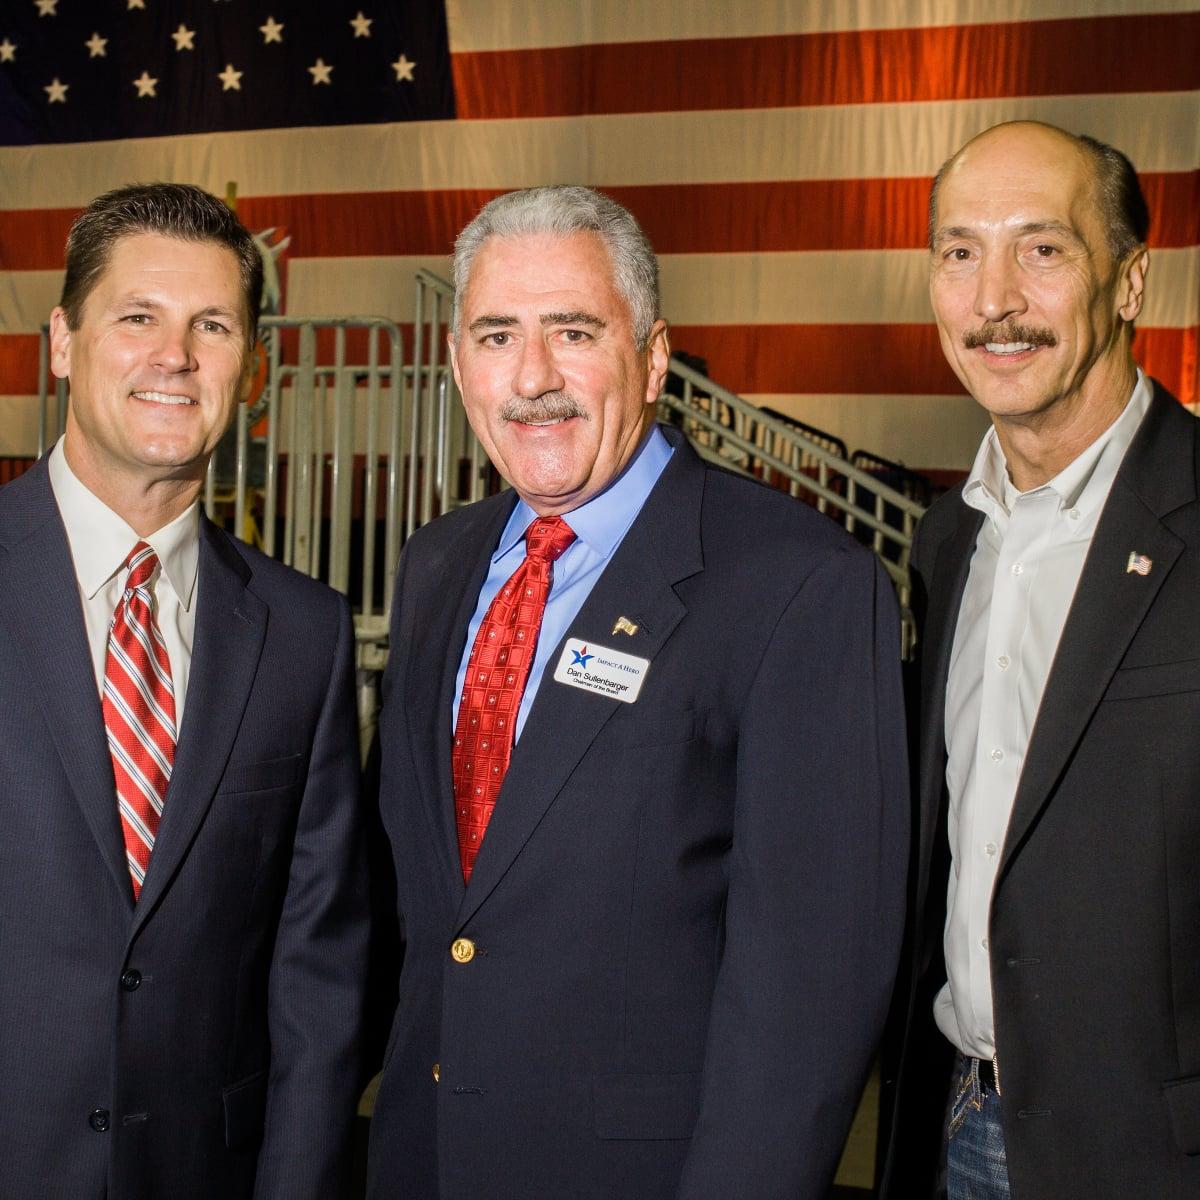 Houston, Impact A Hero Hall of Fame Gala, May 2016, Randy McIlvoy, Dan Sullenbarger, Jim Hoelker